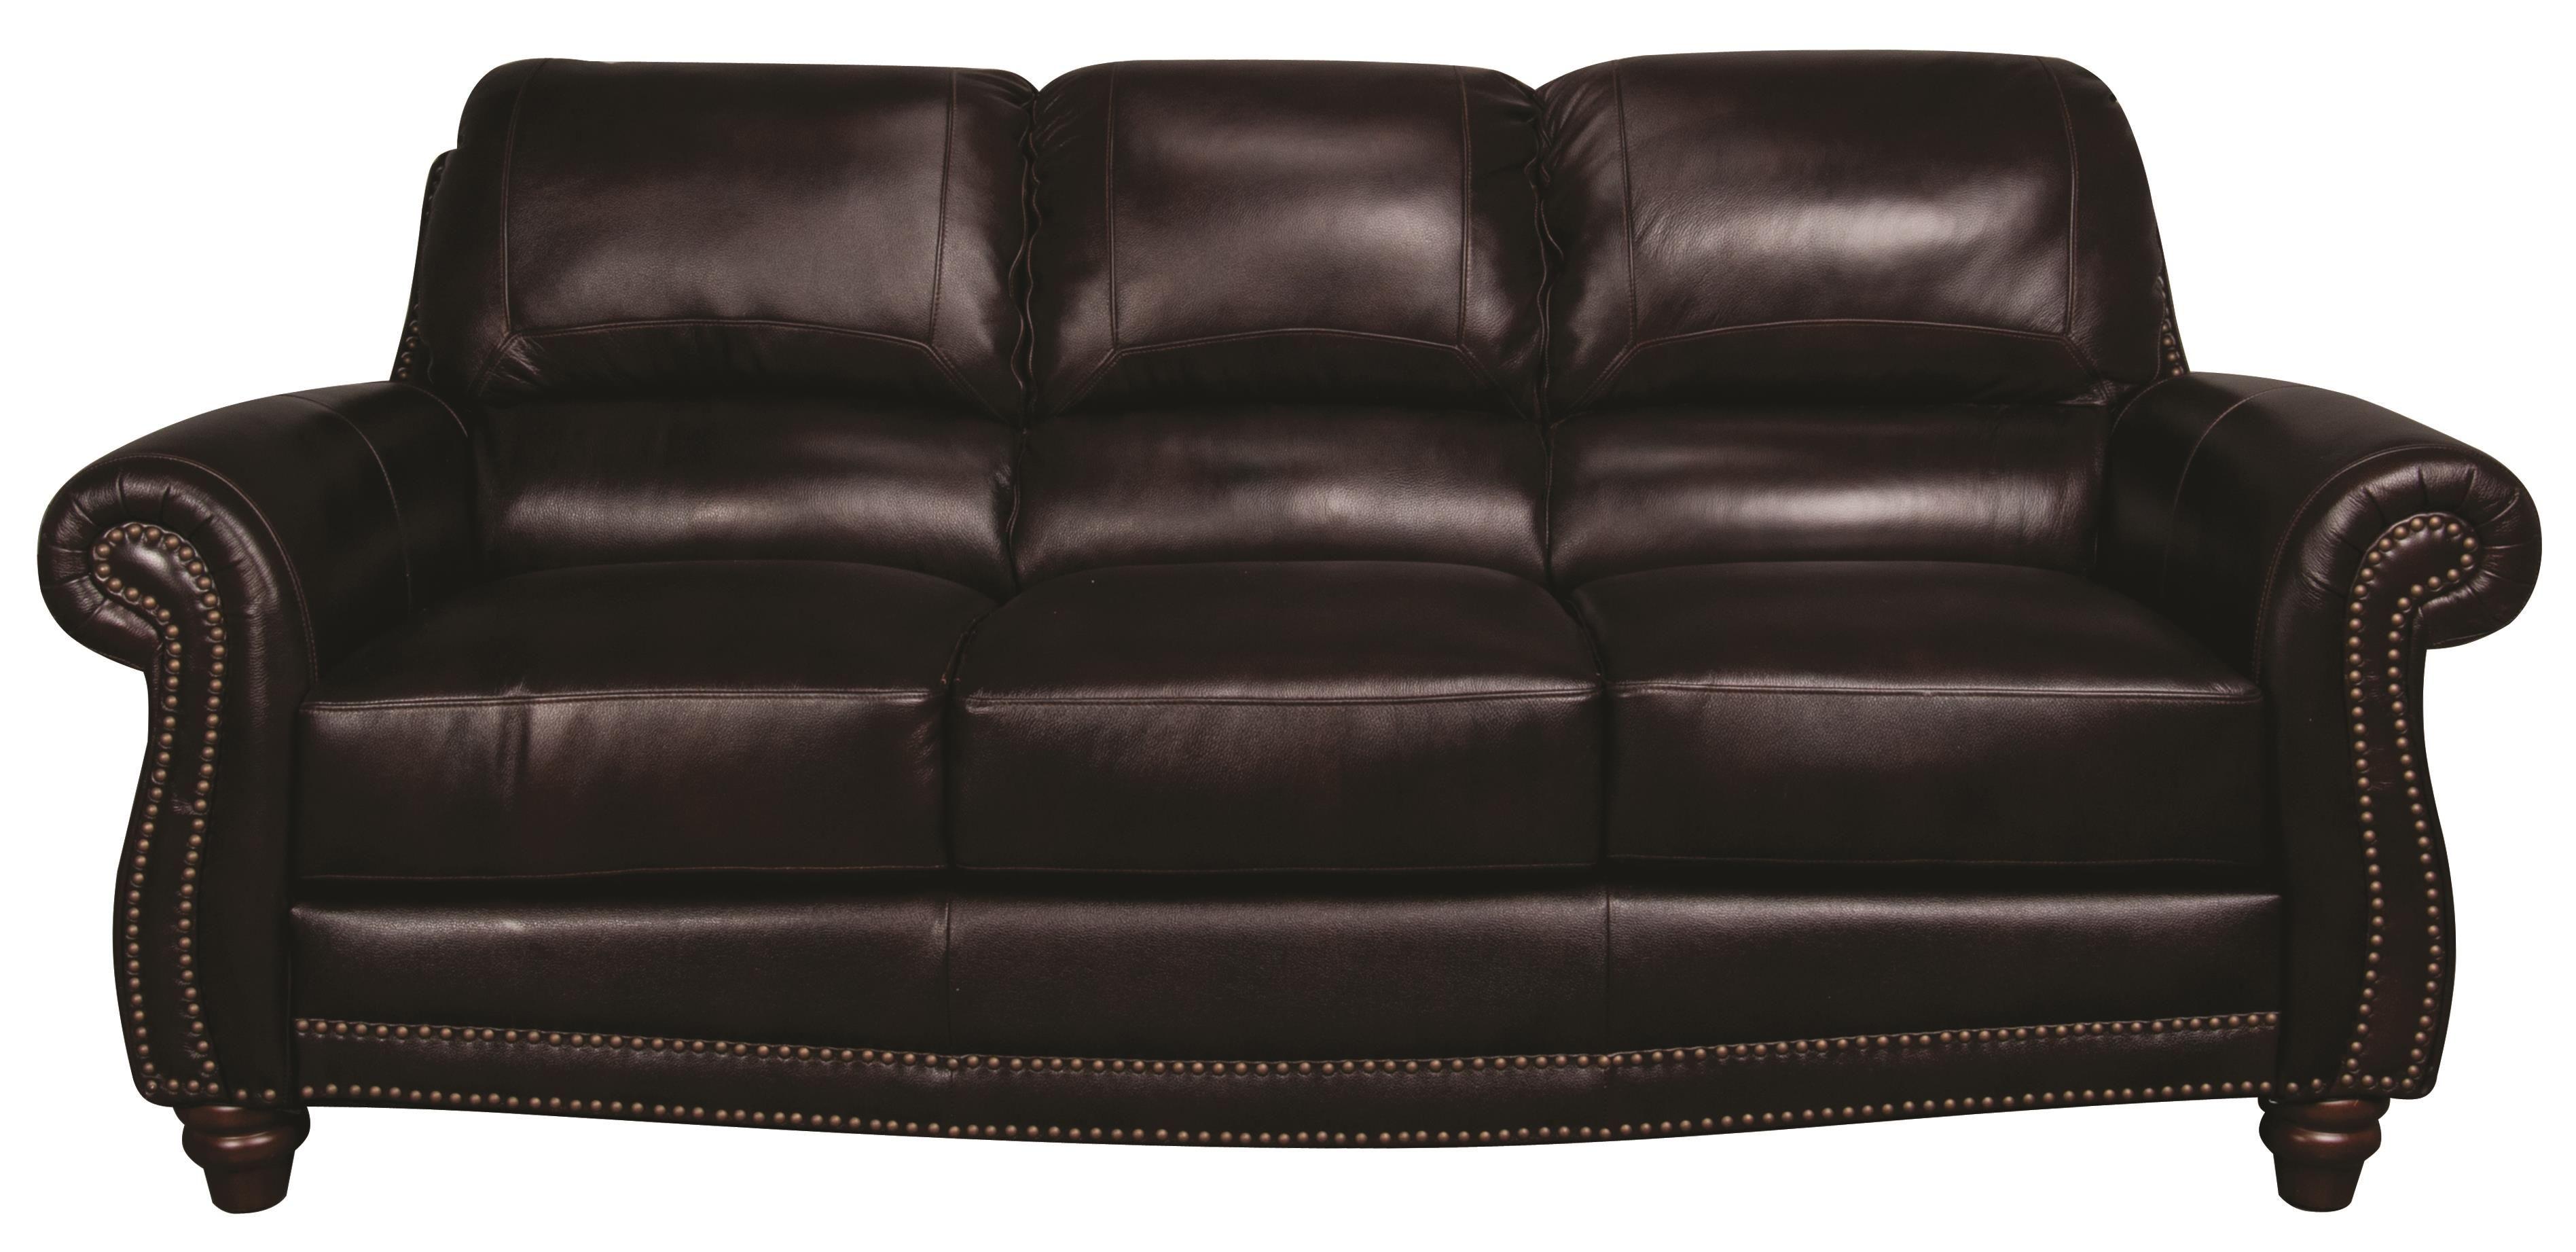 Amari Amari Leather Sofa by Morris Home Furnishings